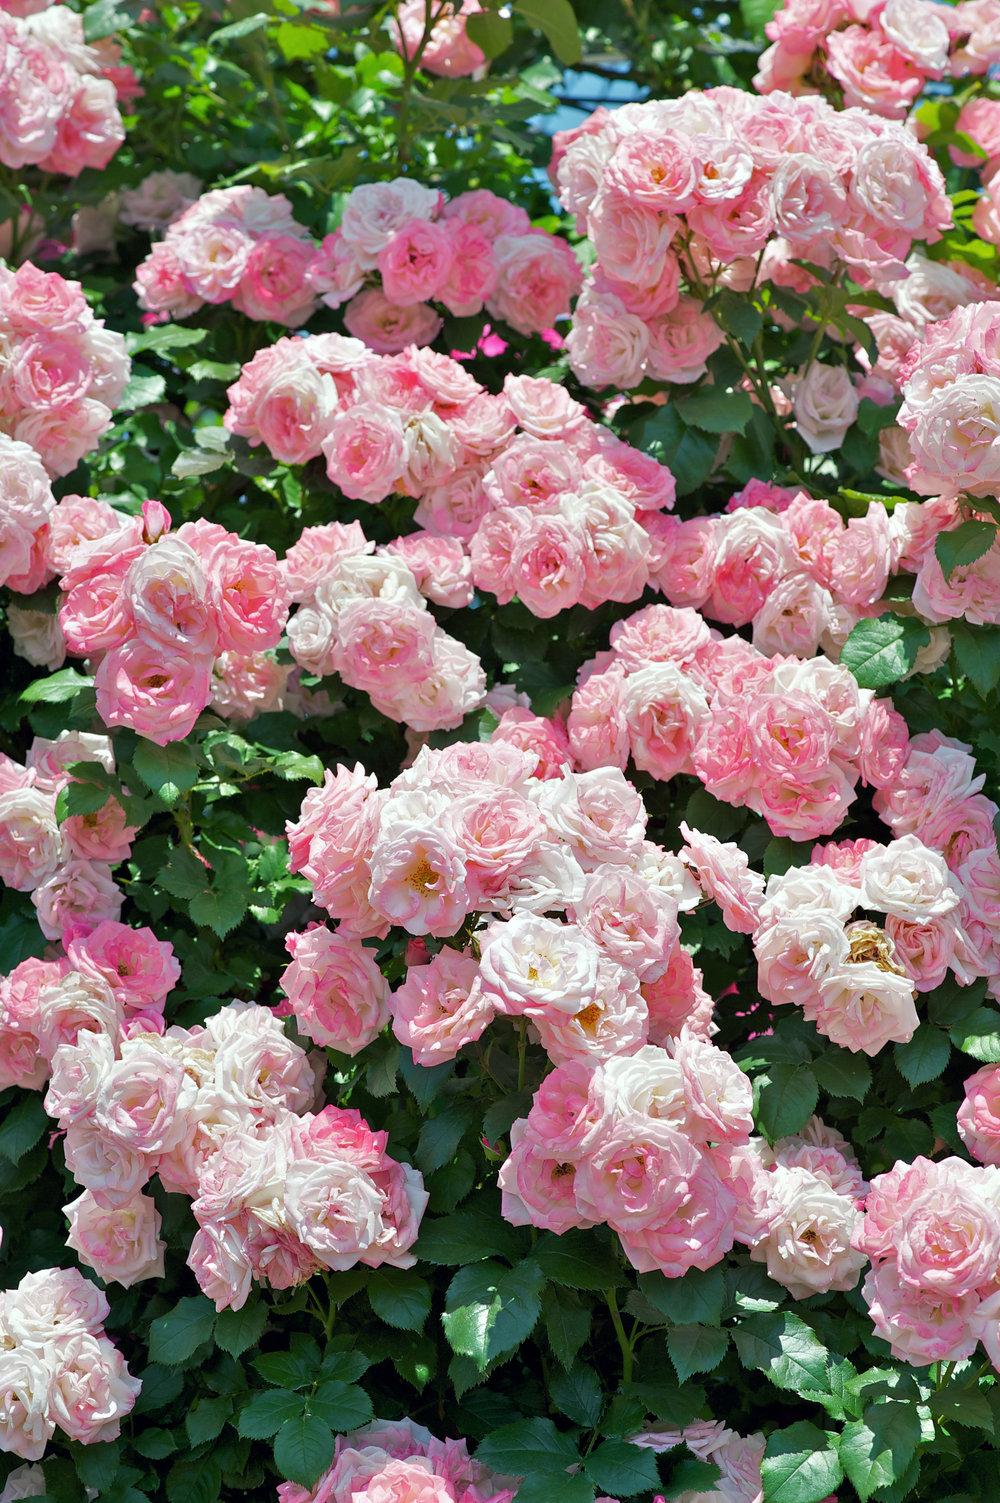 Climbing Roses - shutterstock_103838252.jpg